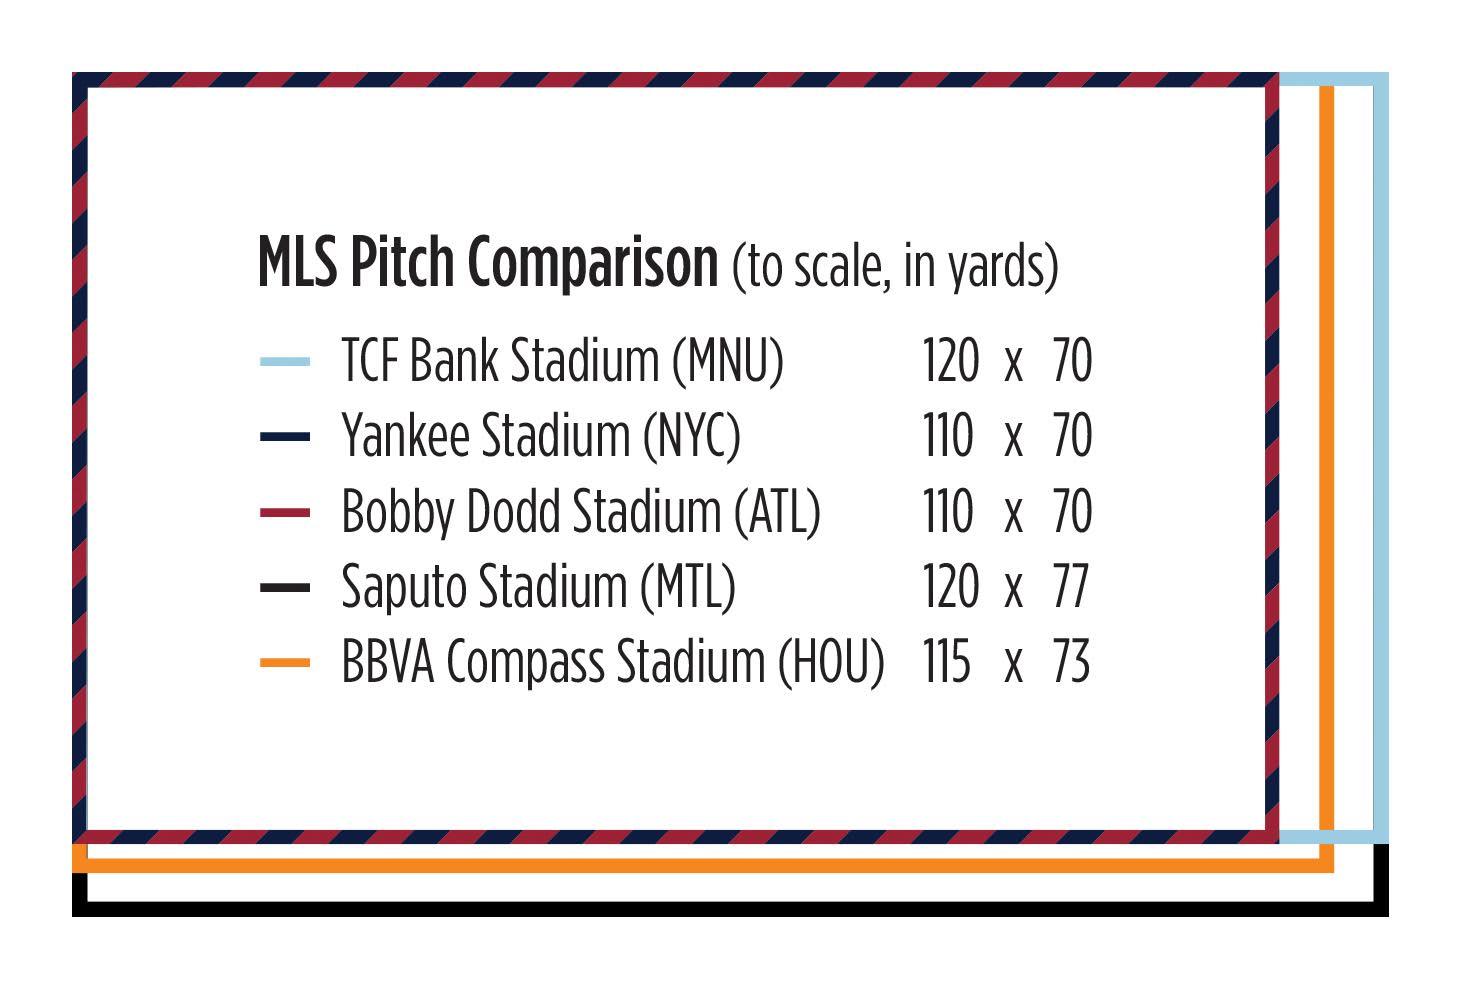 Home-Field Advantage? Adapting to TCF Bank Stadium's Pitch